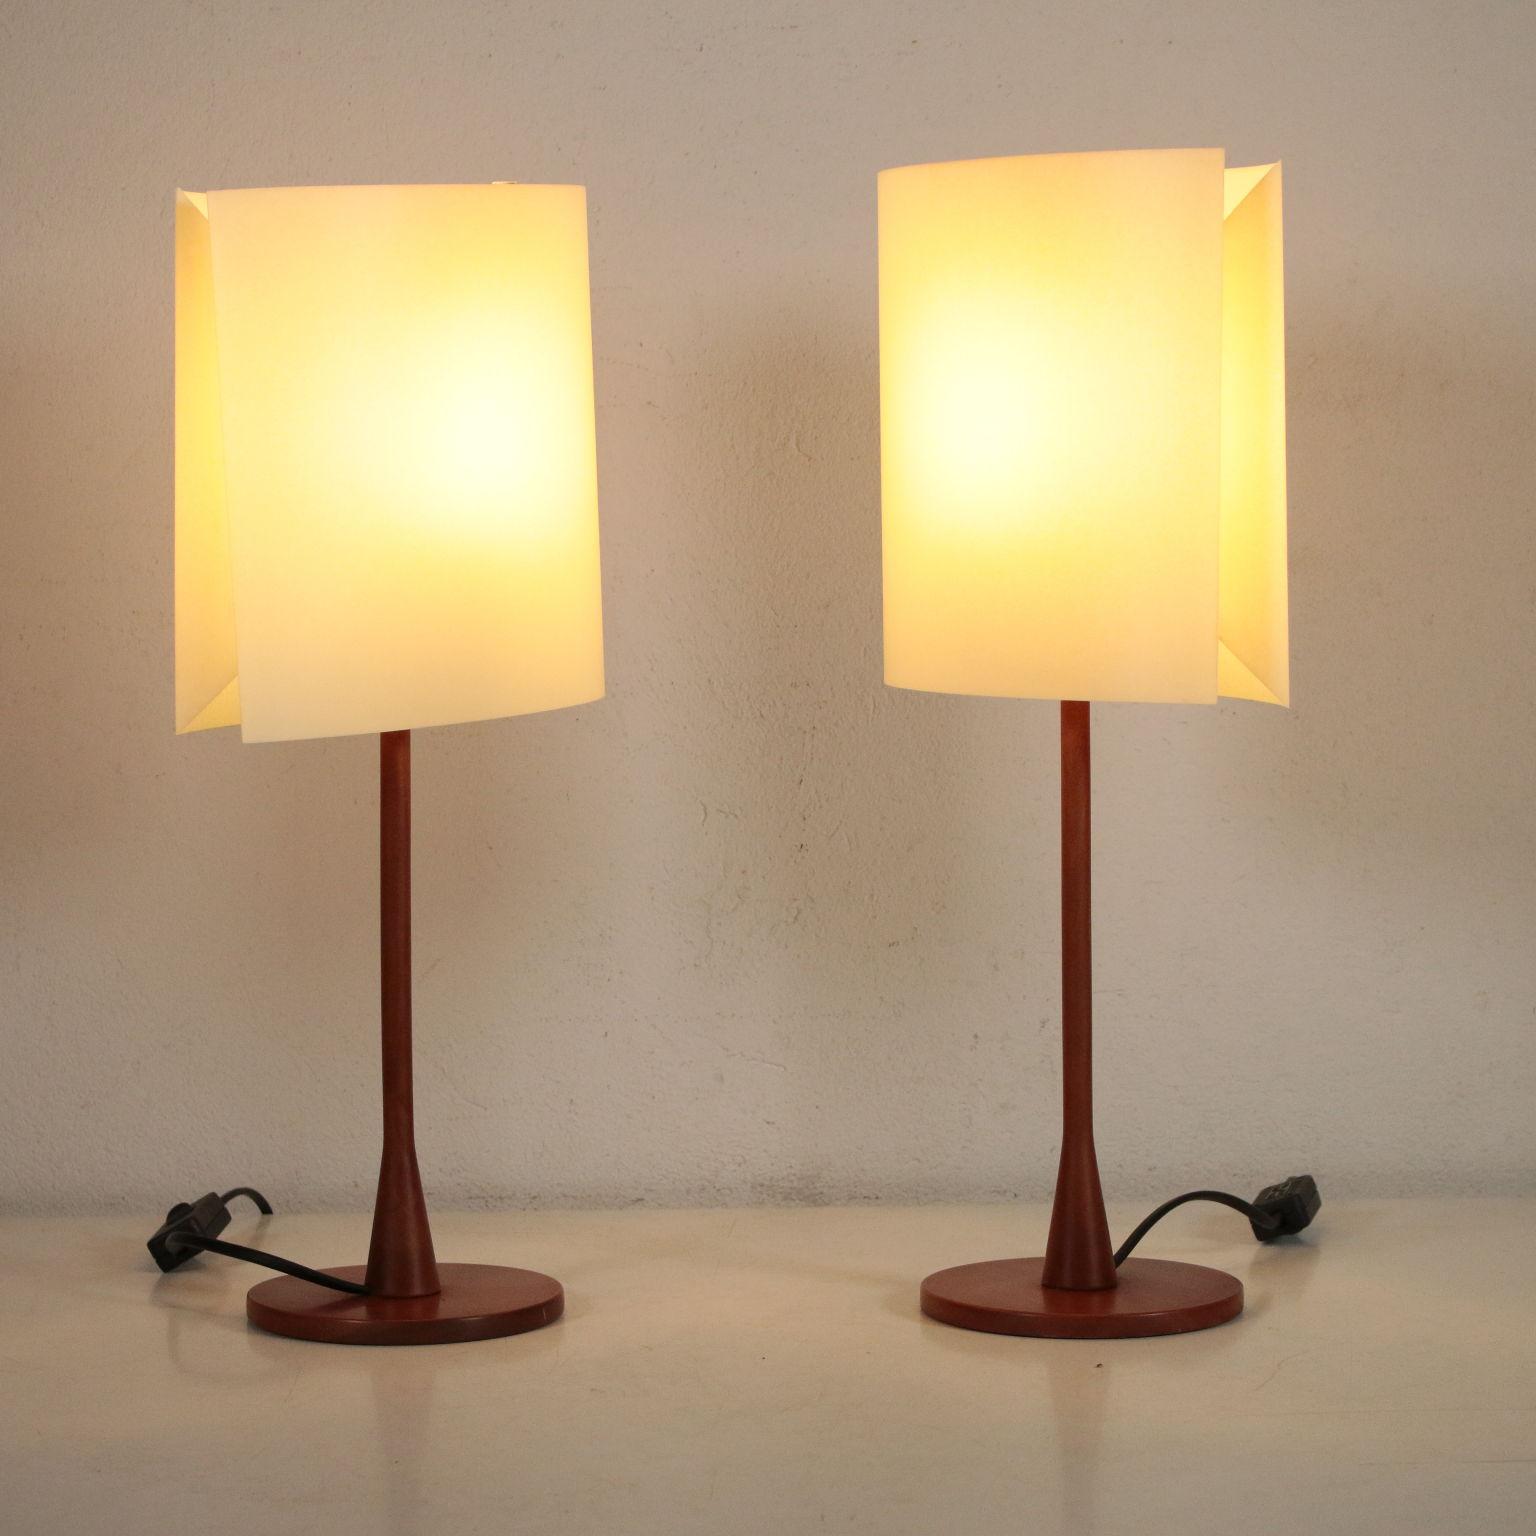 Lampade Fontanaarte Illuminazione Modernariato Dimanoinmano It